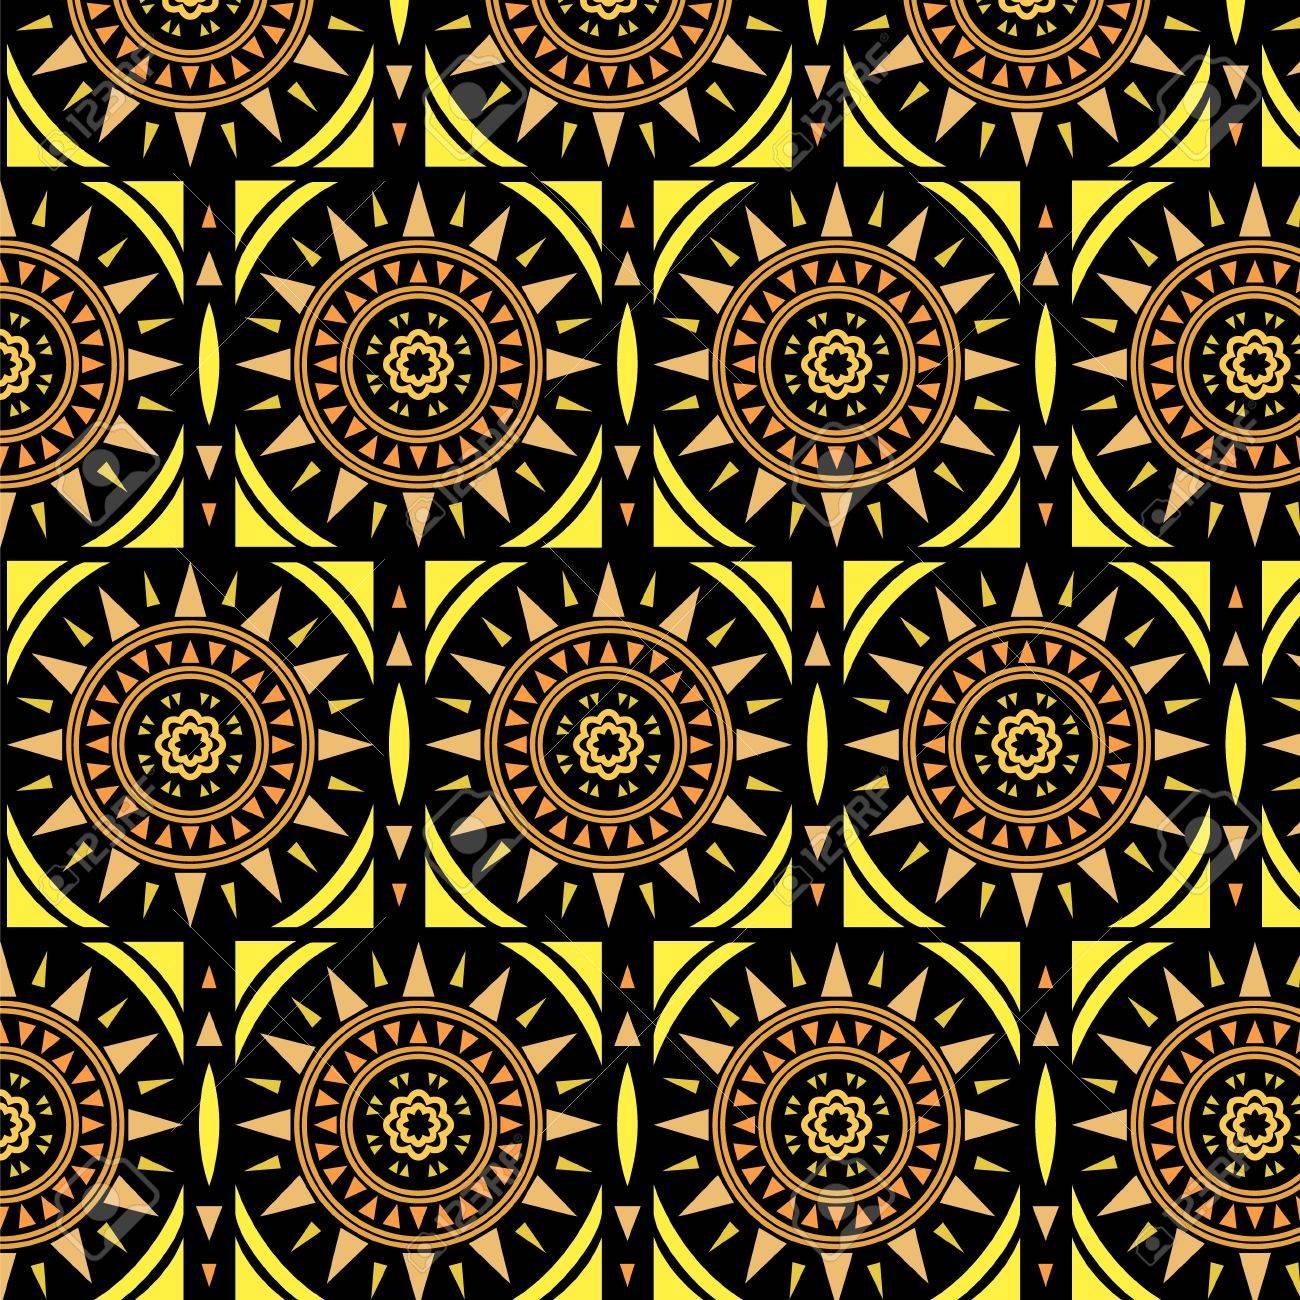 Moroccan tile solar seamless pattern, Stock Vector - 15608470